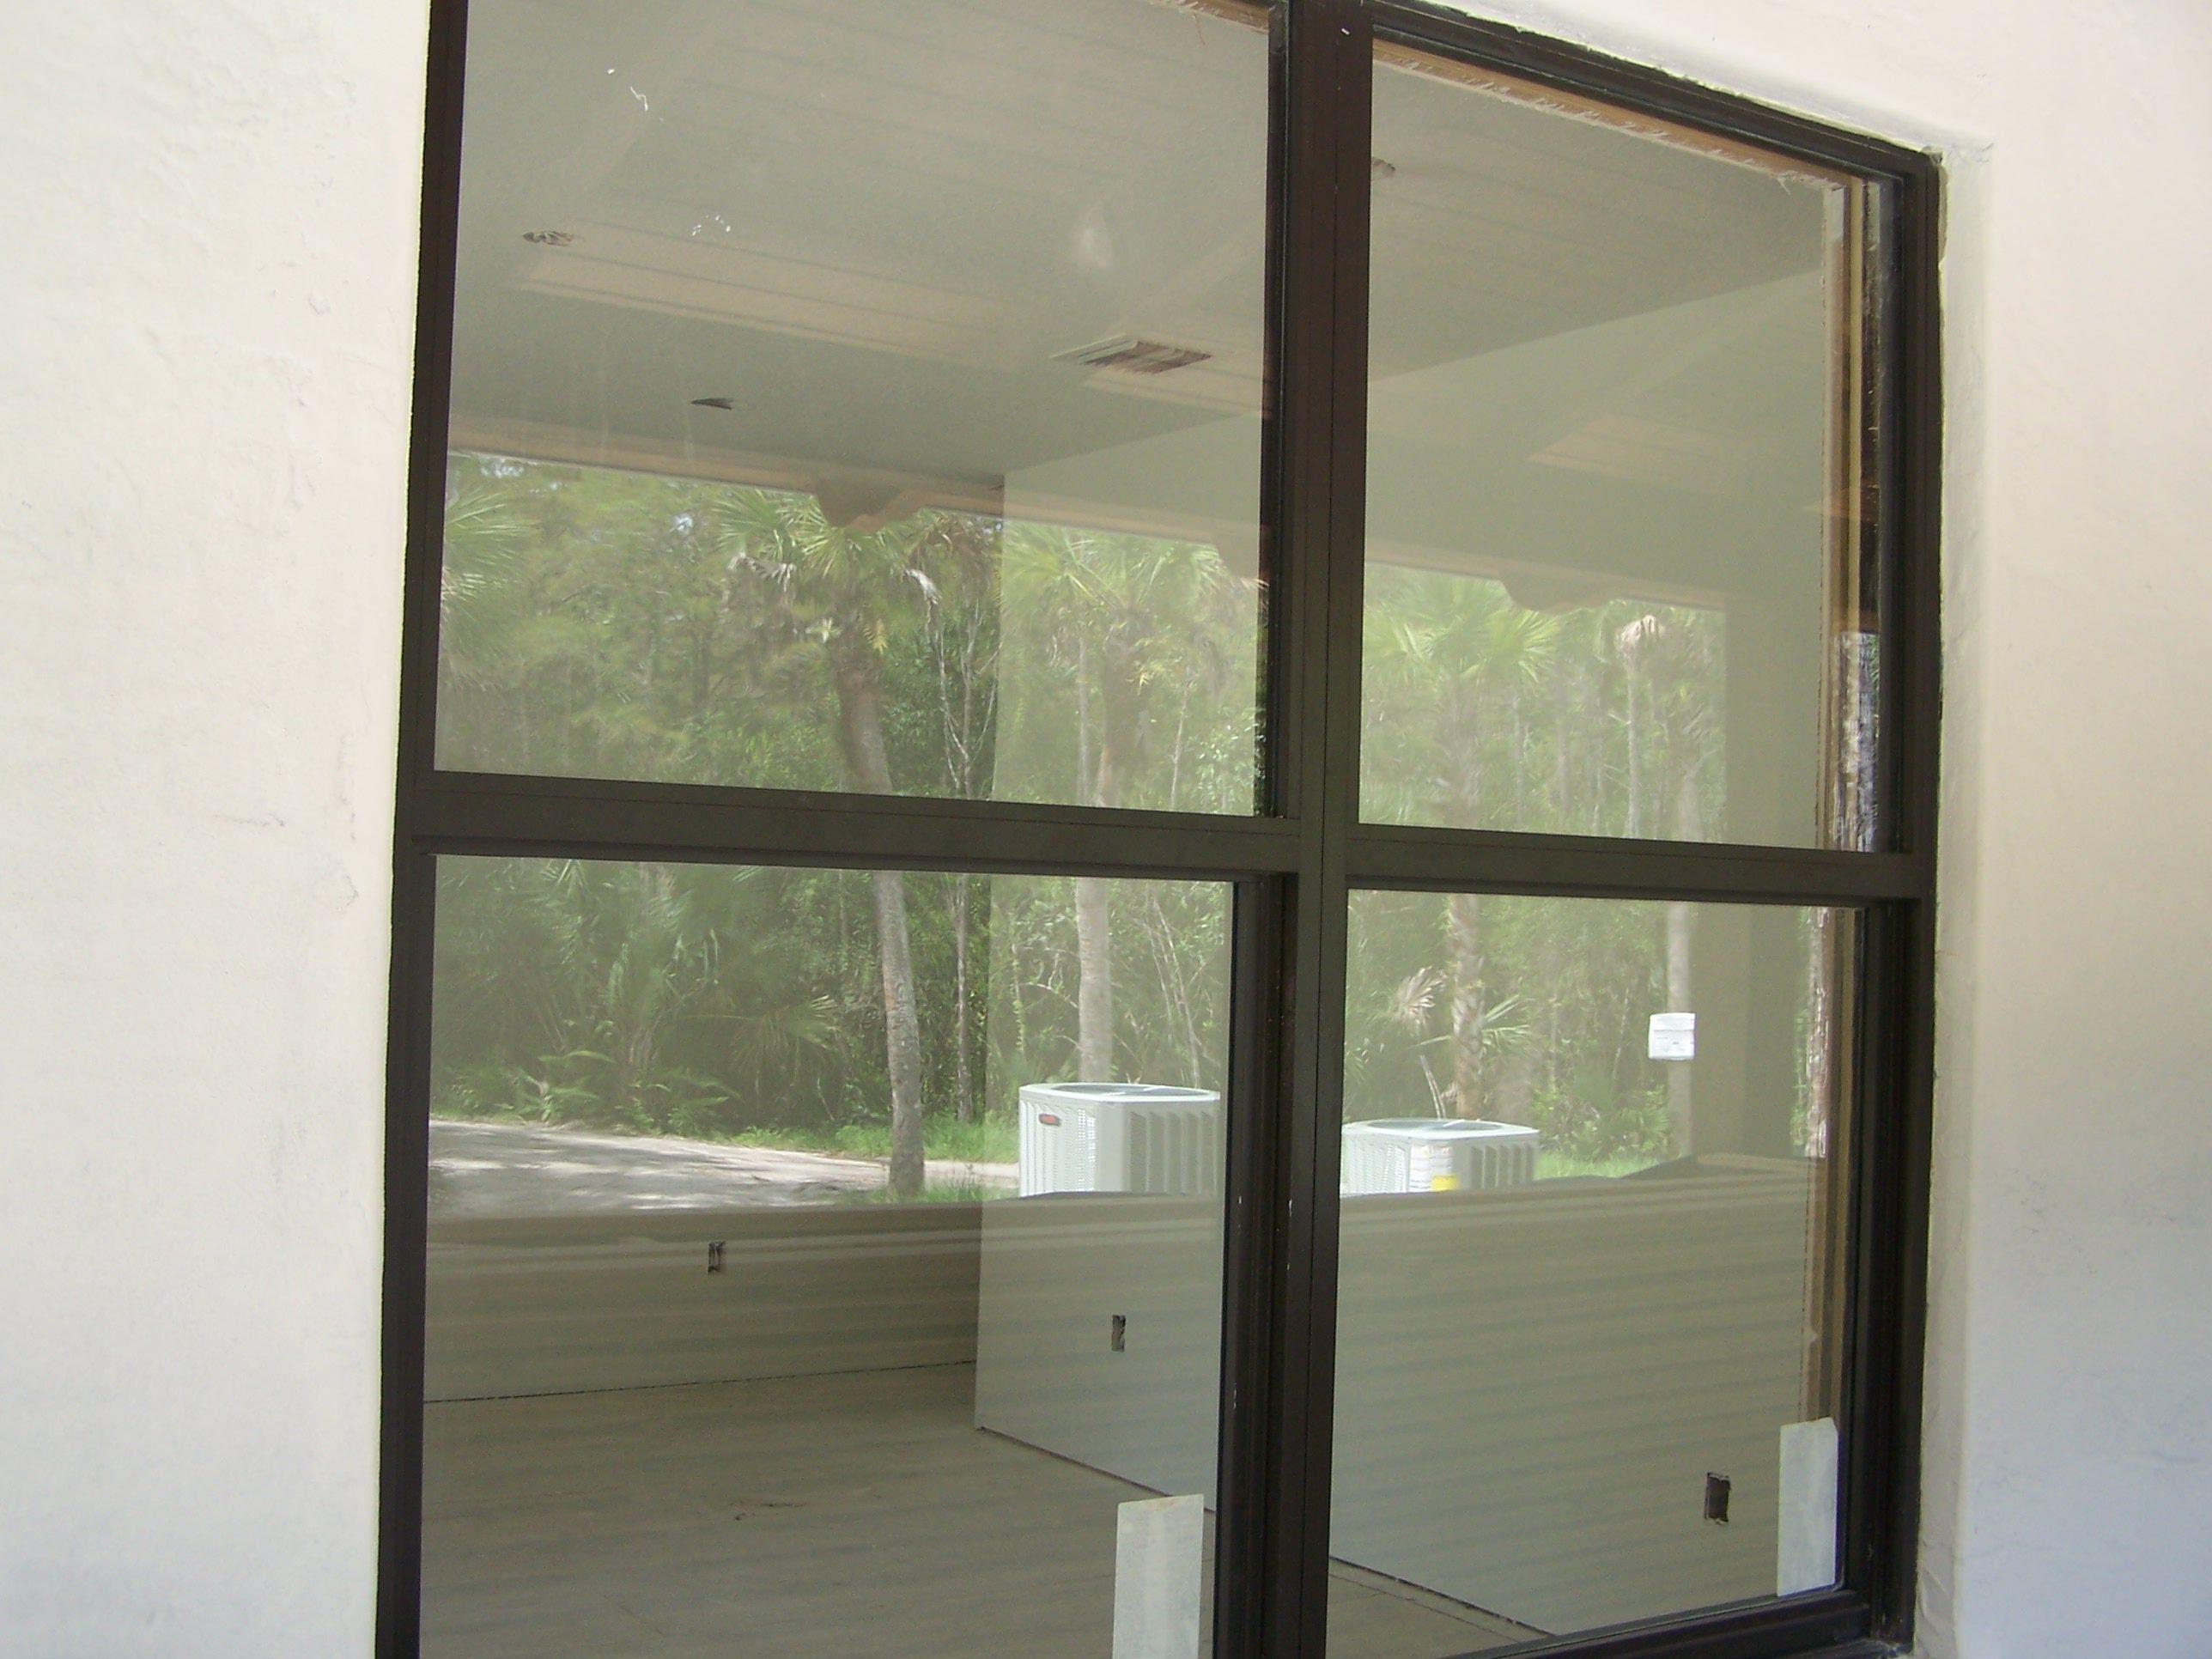 Pgt Windows Florida Home Windows And Doors Windows